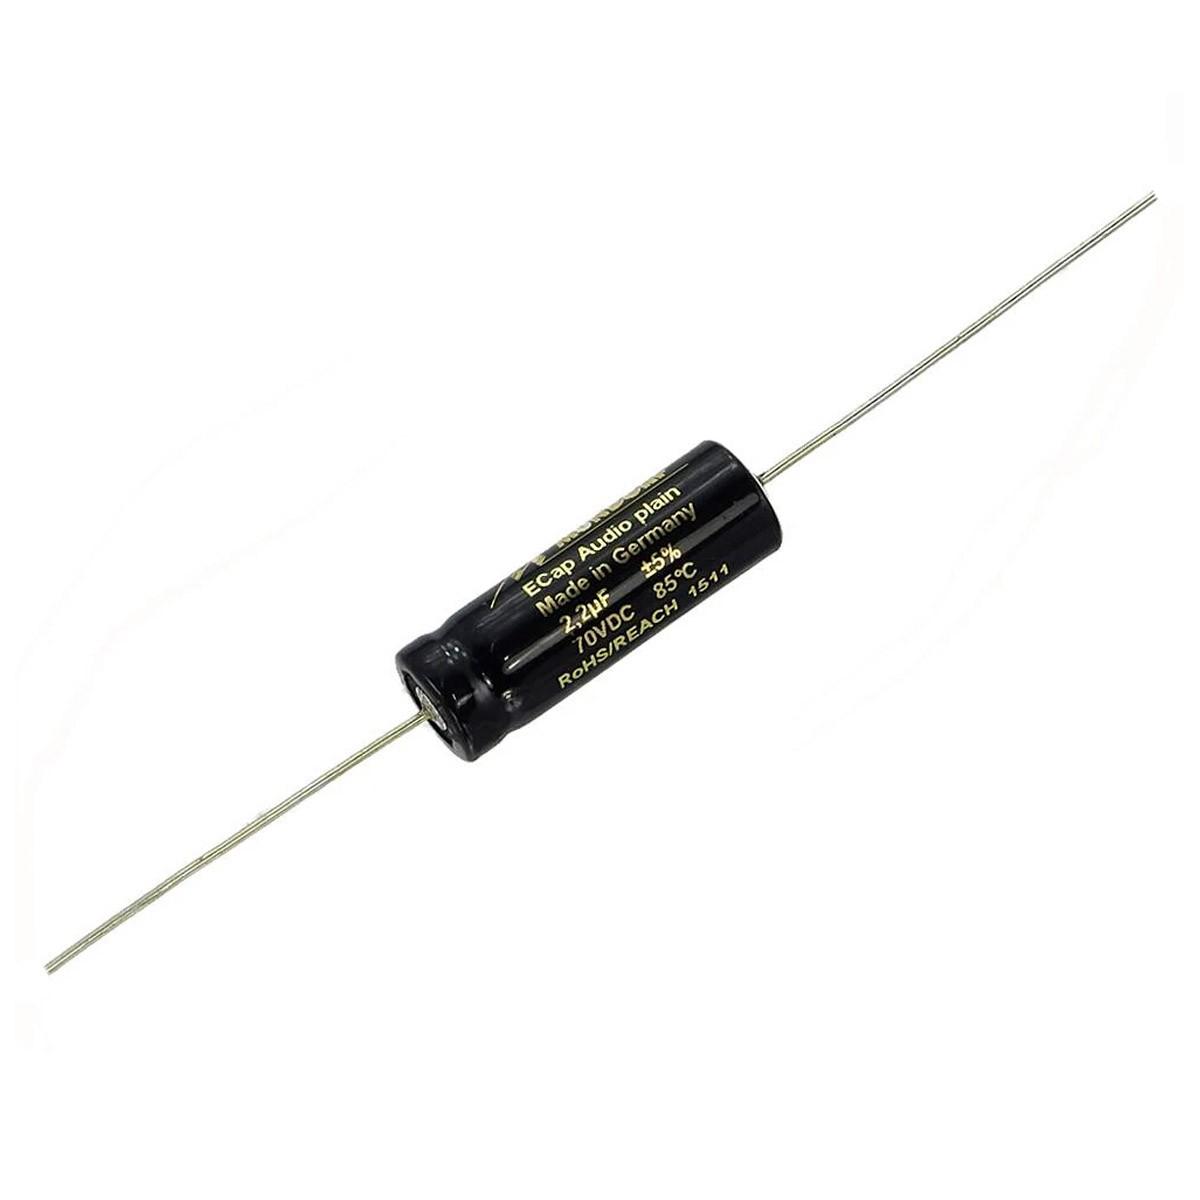 MUNDORF E-CAP ECAP70 (BG50) PLAIN Condensateur 70VDC 50VAC 15µF